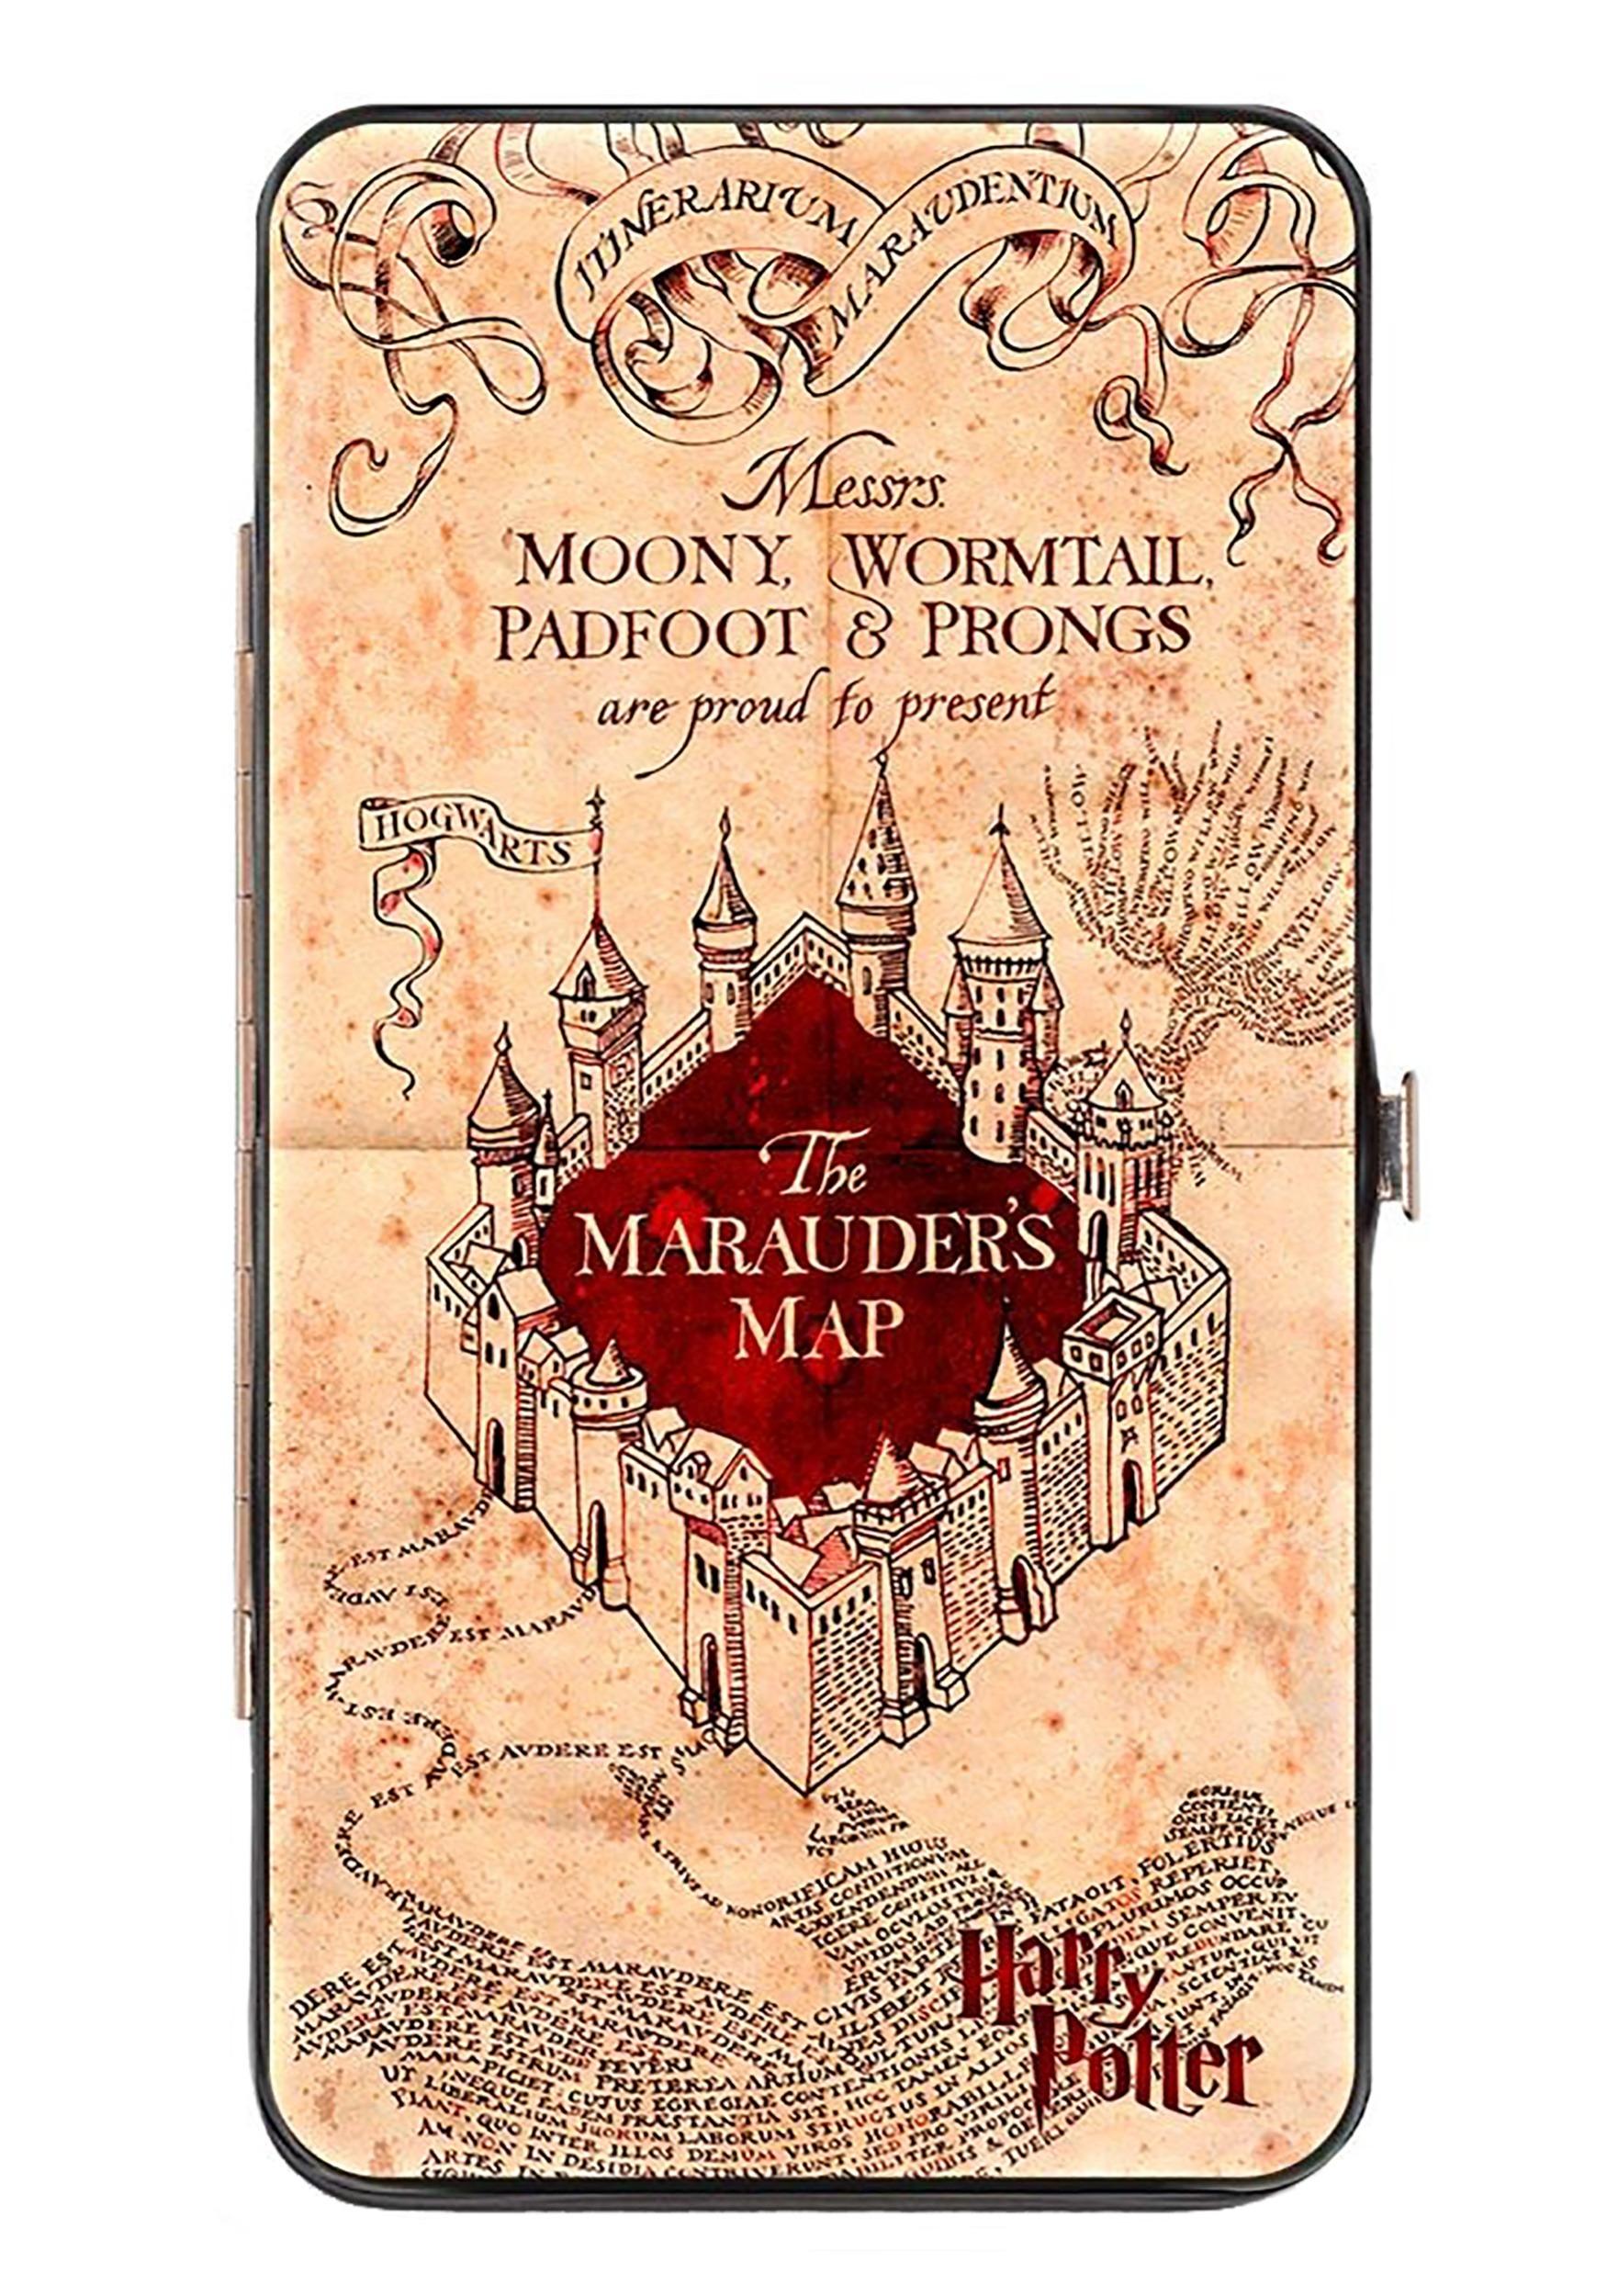 Hogwarts_Marauders_Map_Harry_Potter_Hinged_Wallet